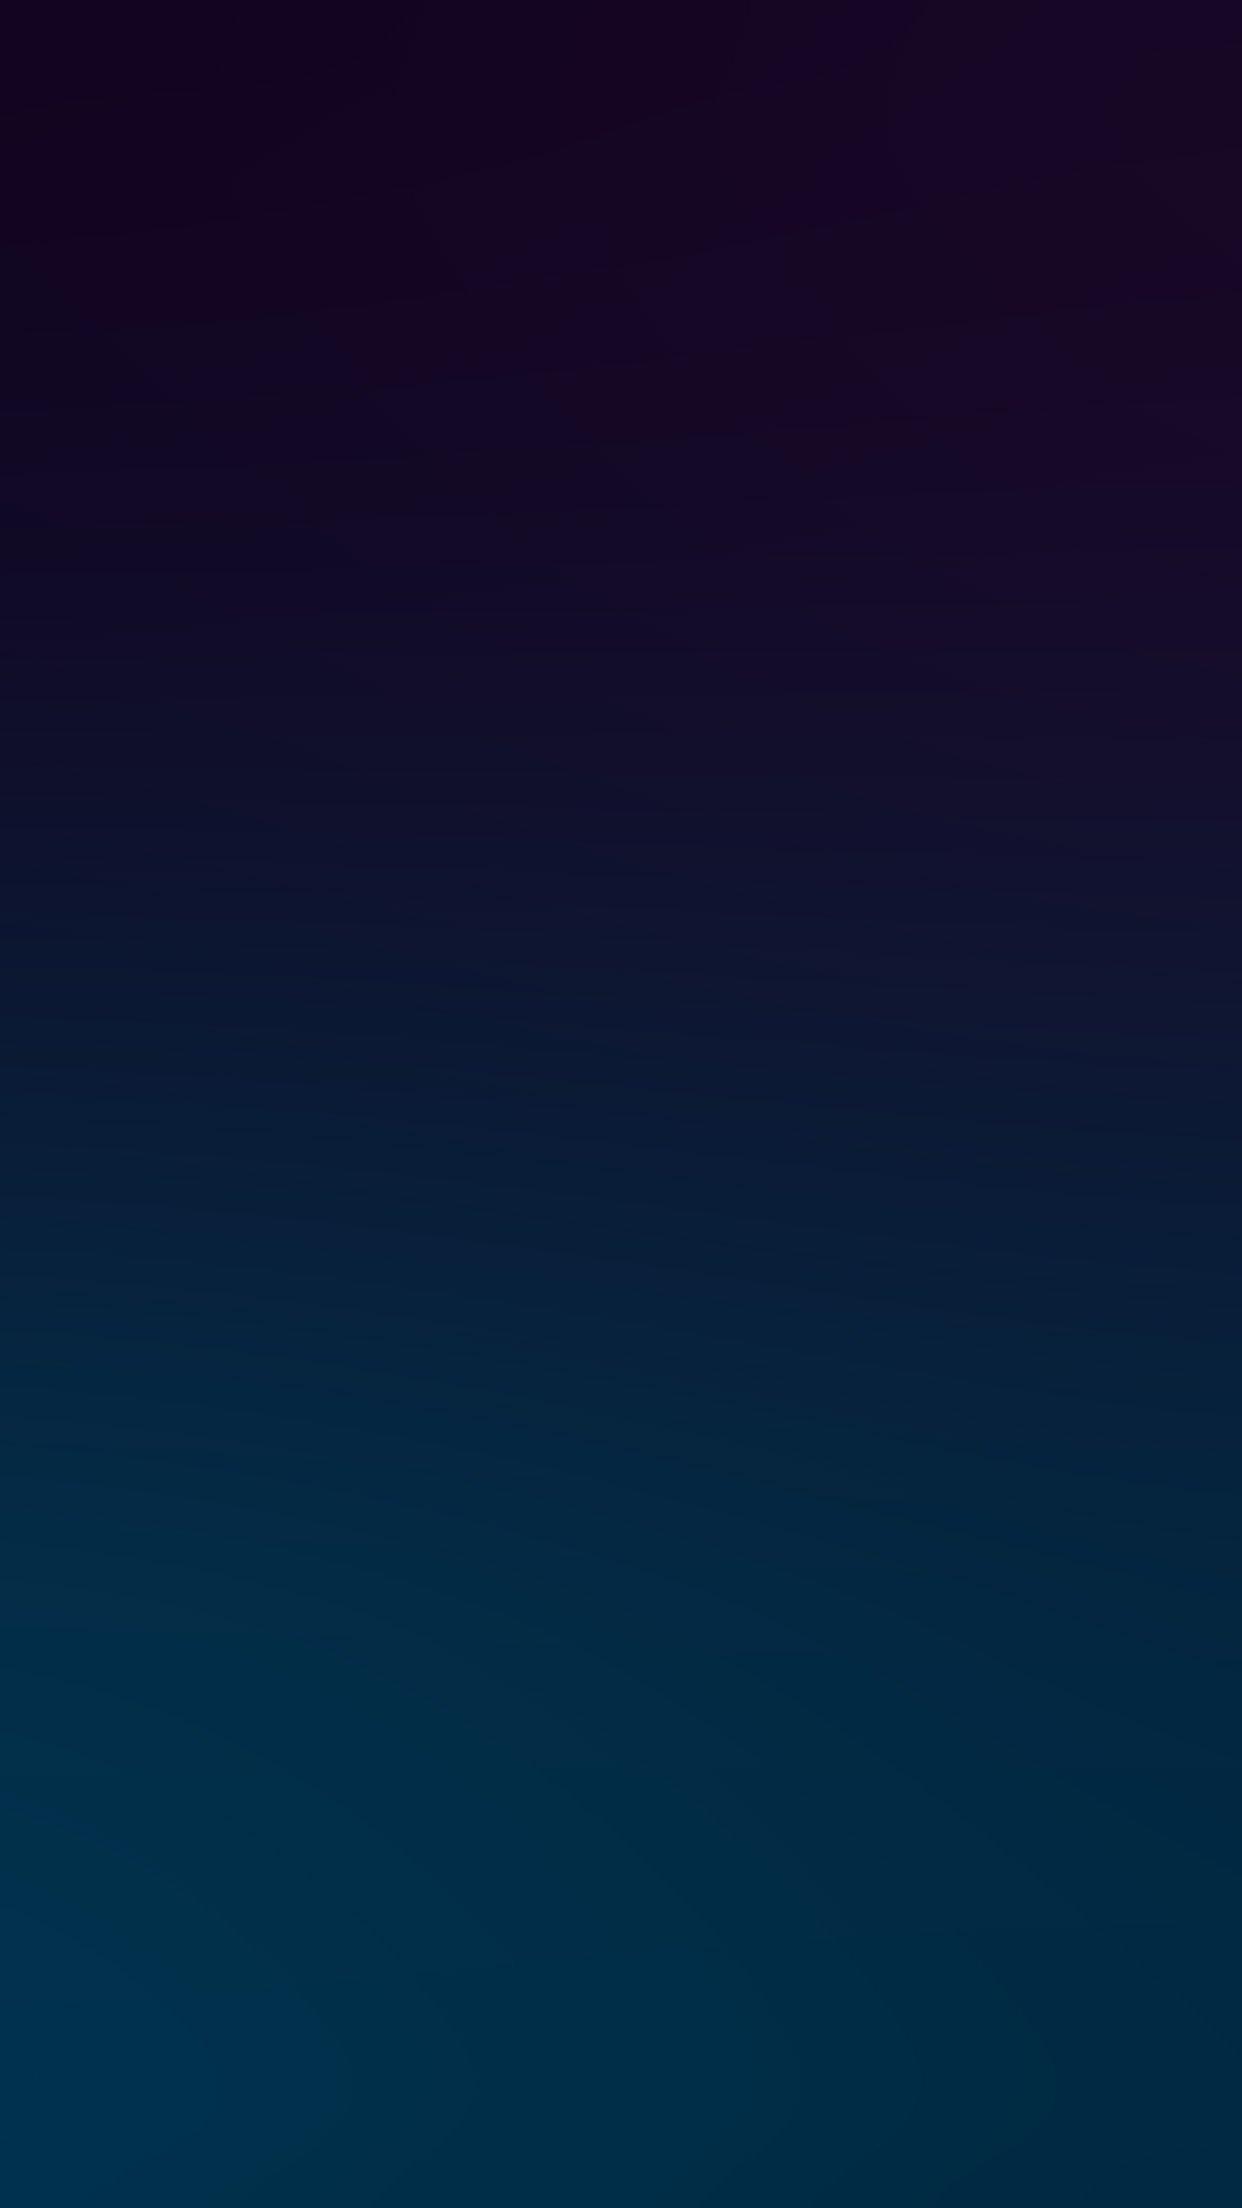 Blue Wallpaper Iphone 7 1242x2208 Wallpaper Teahub Io